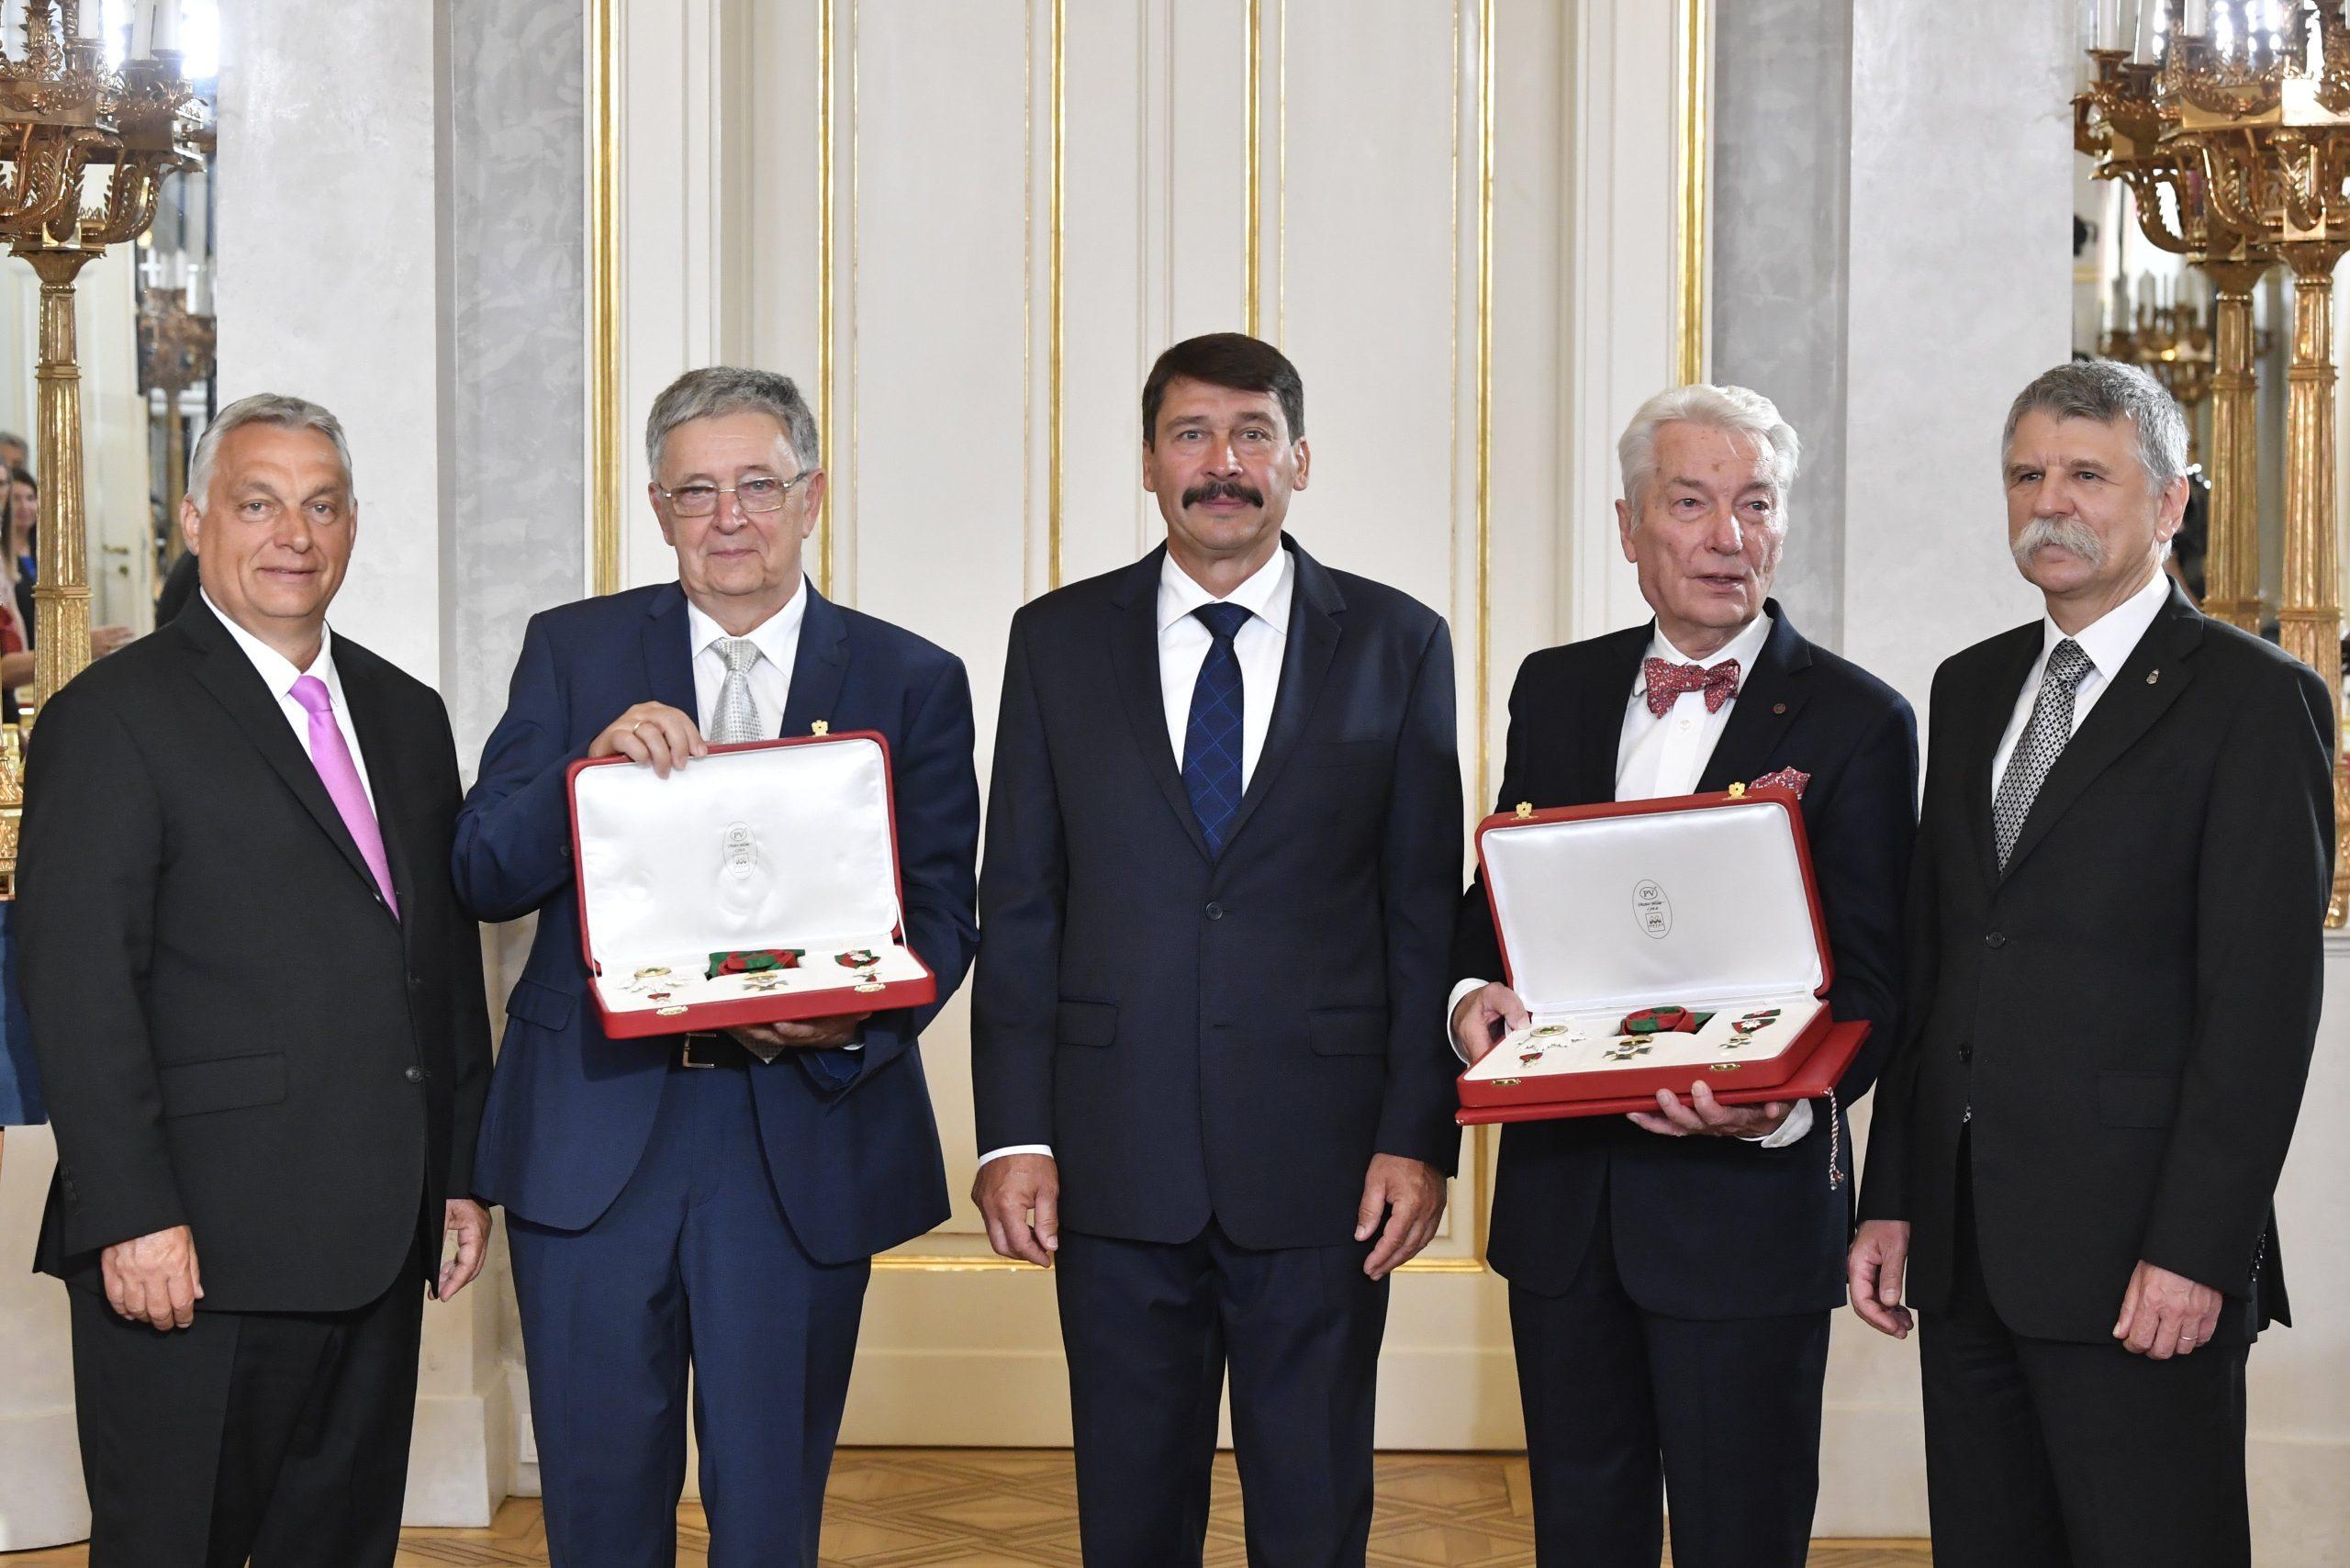 Former Science Academy Leaders E. Sylvester Vizi and László Lovász Receive the Hungarian Order of Saint Stephen, Hungary's Highest Decoration